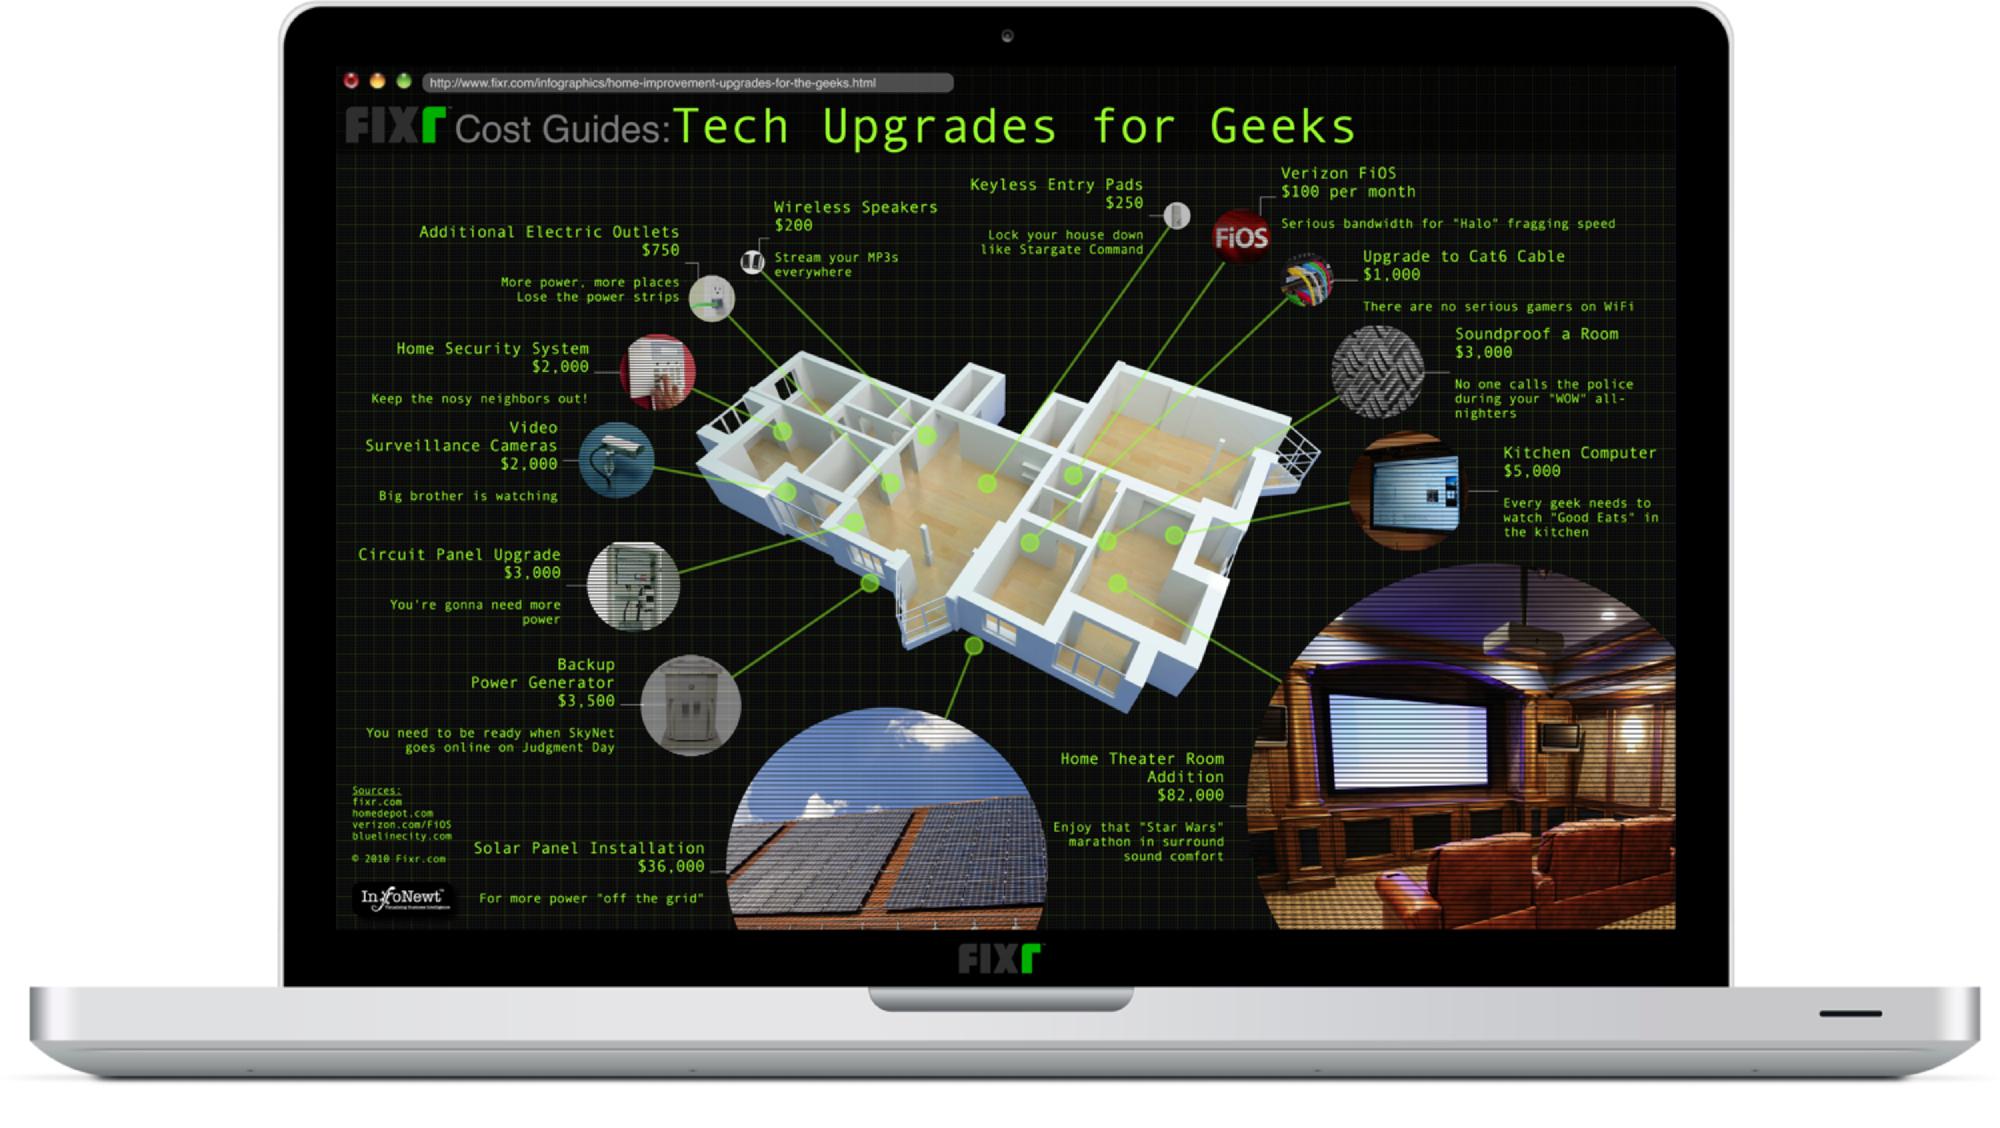 Geek House Upgrades